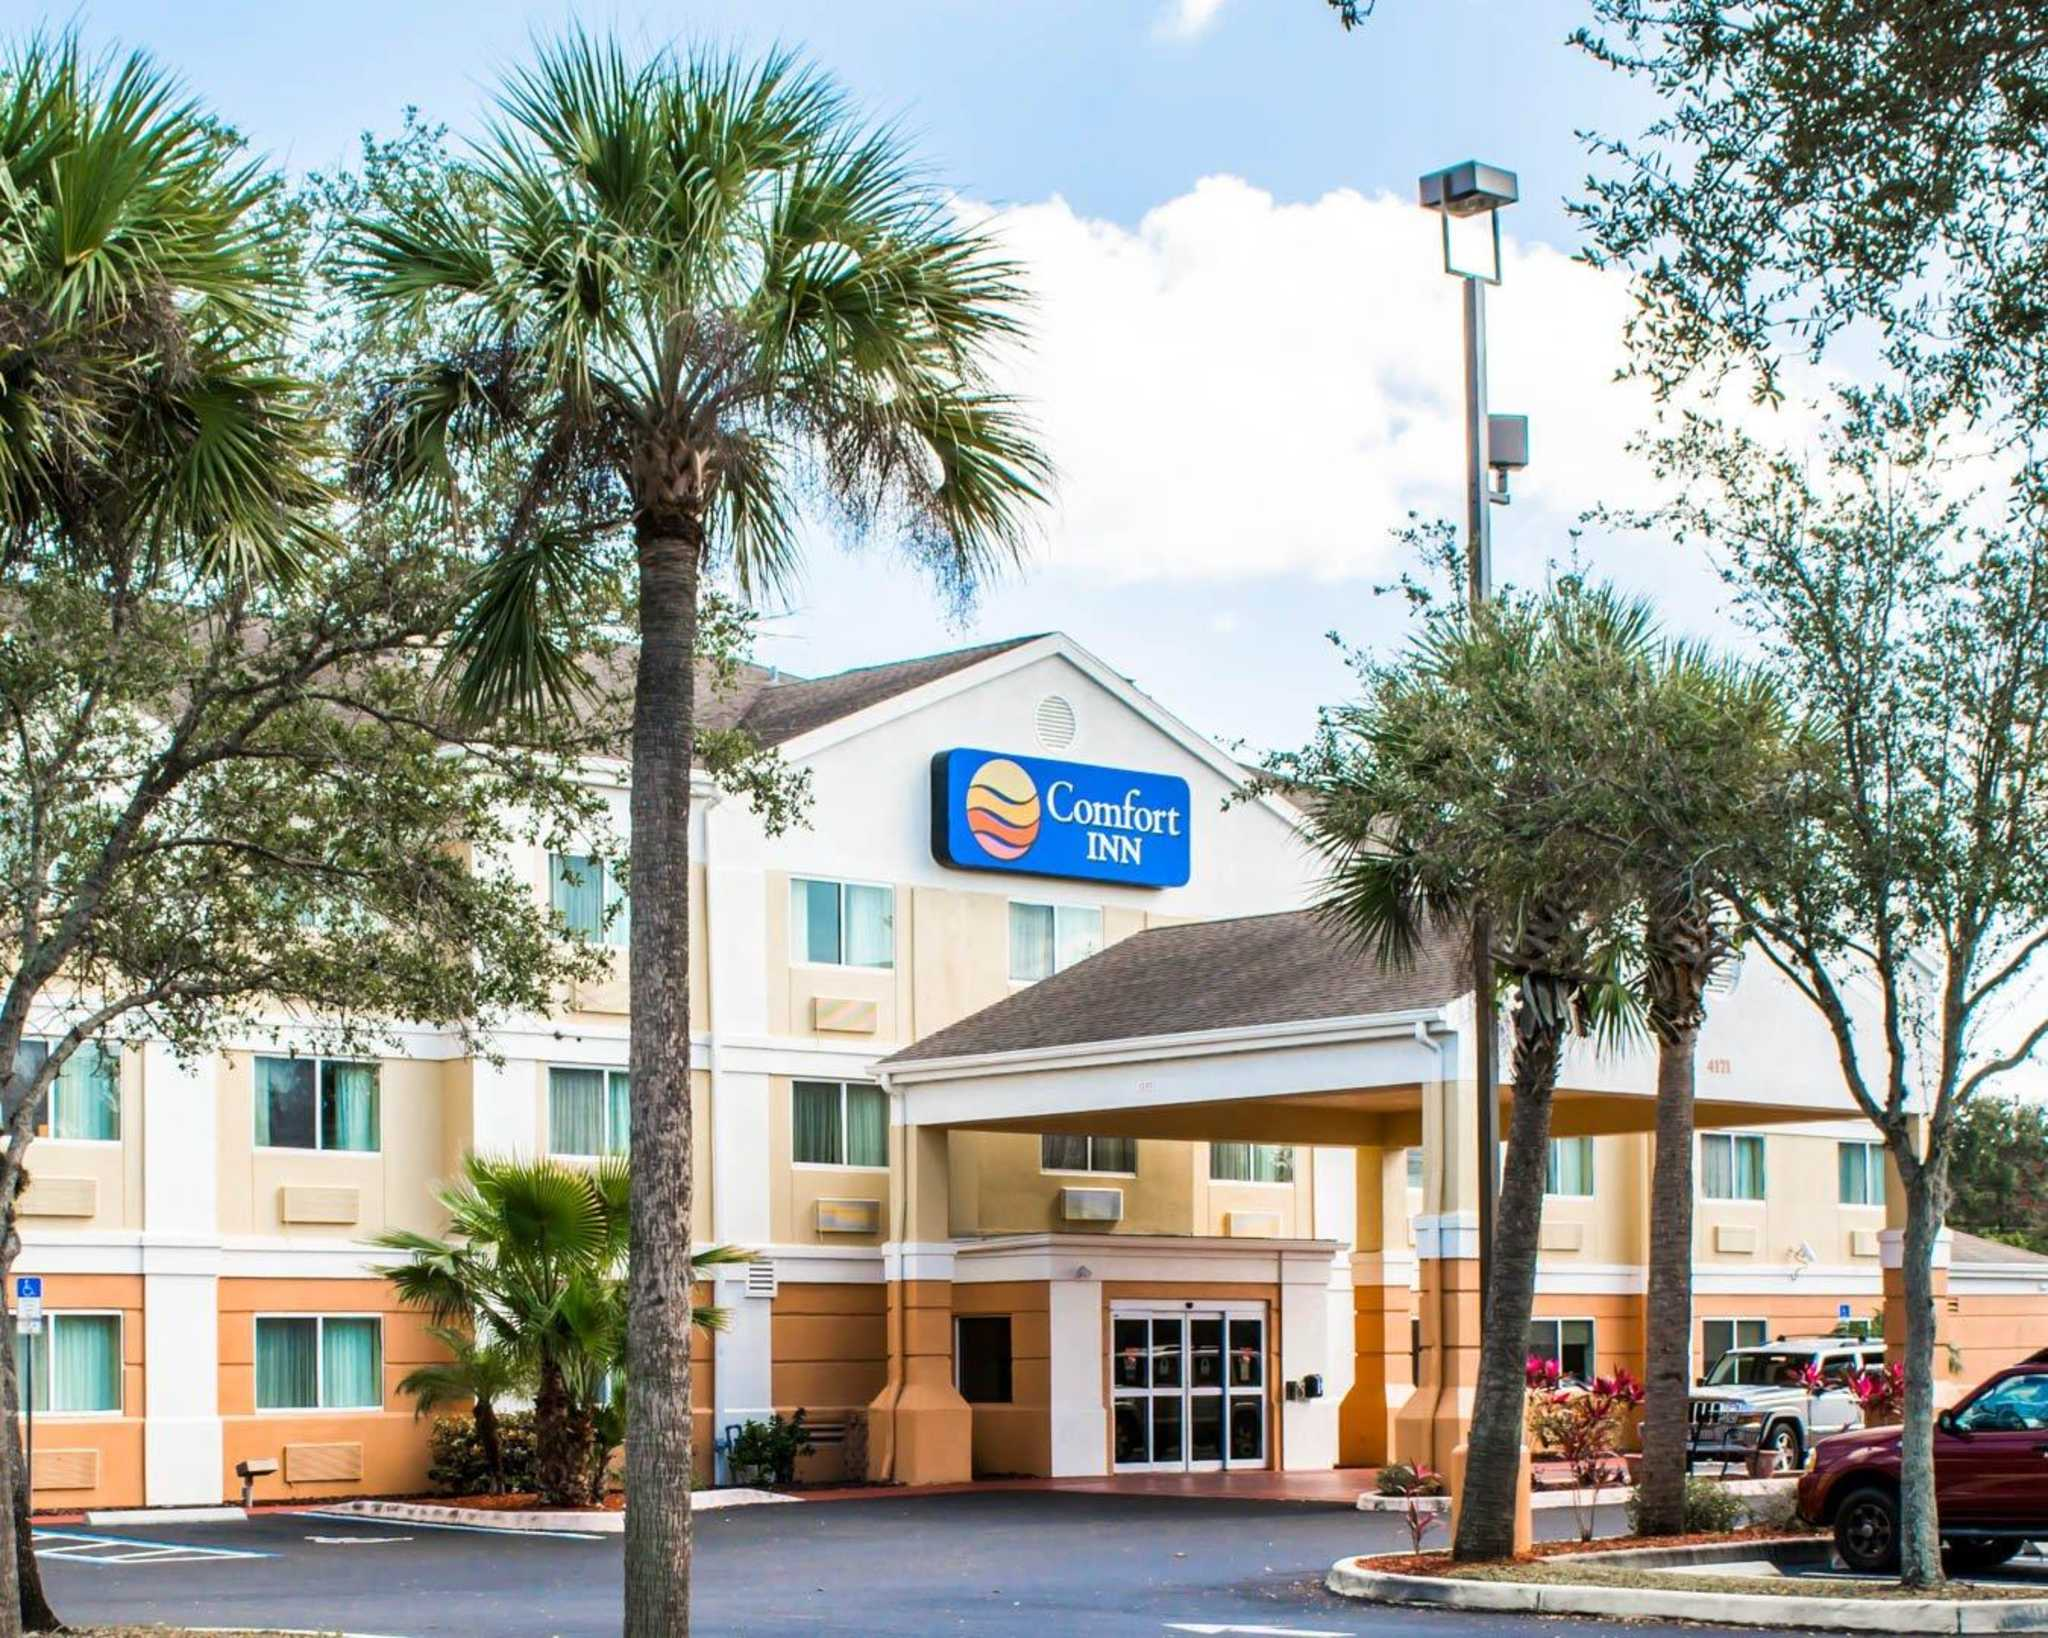 Comfort Inn Fort Myers Northeast image 2